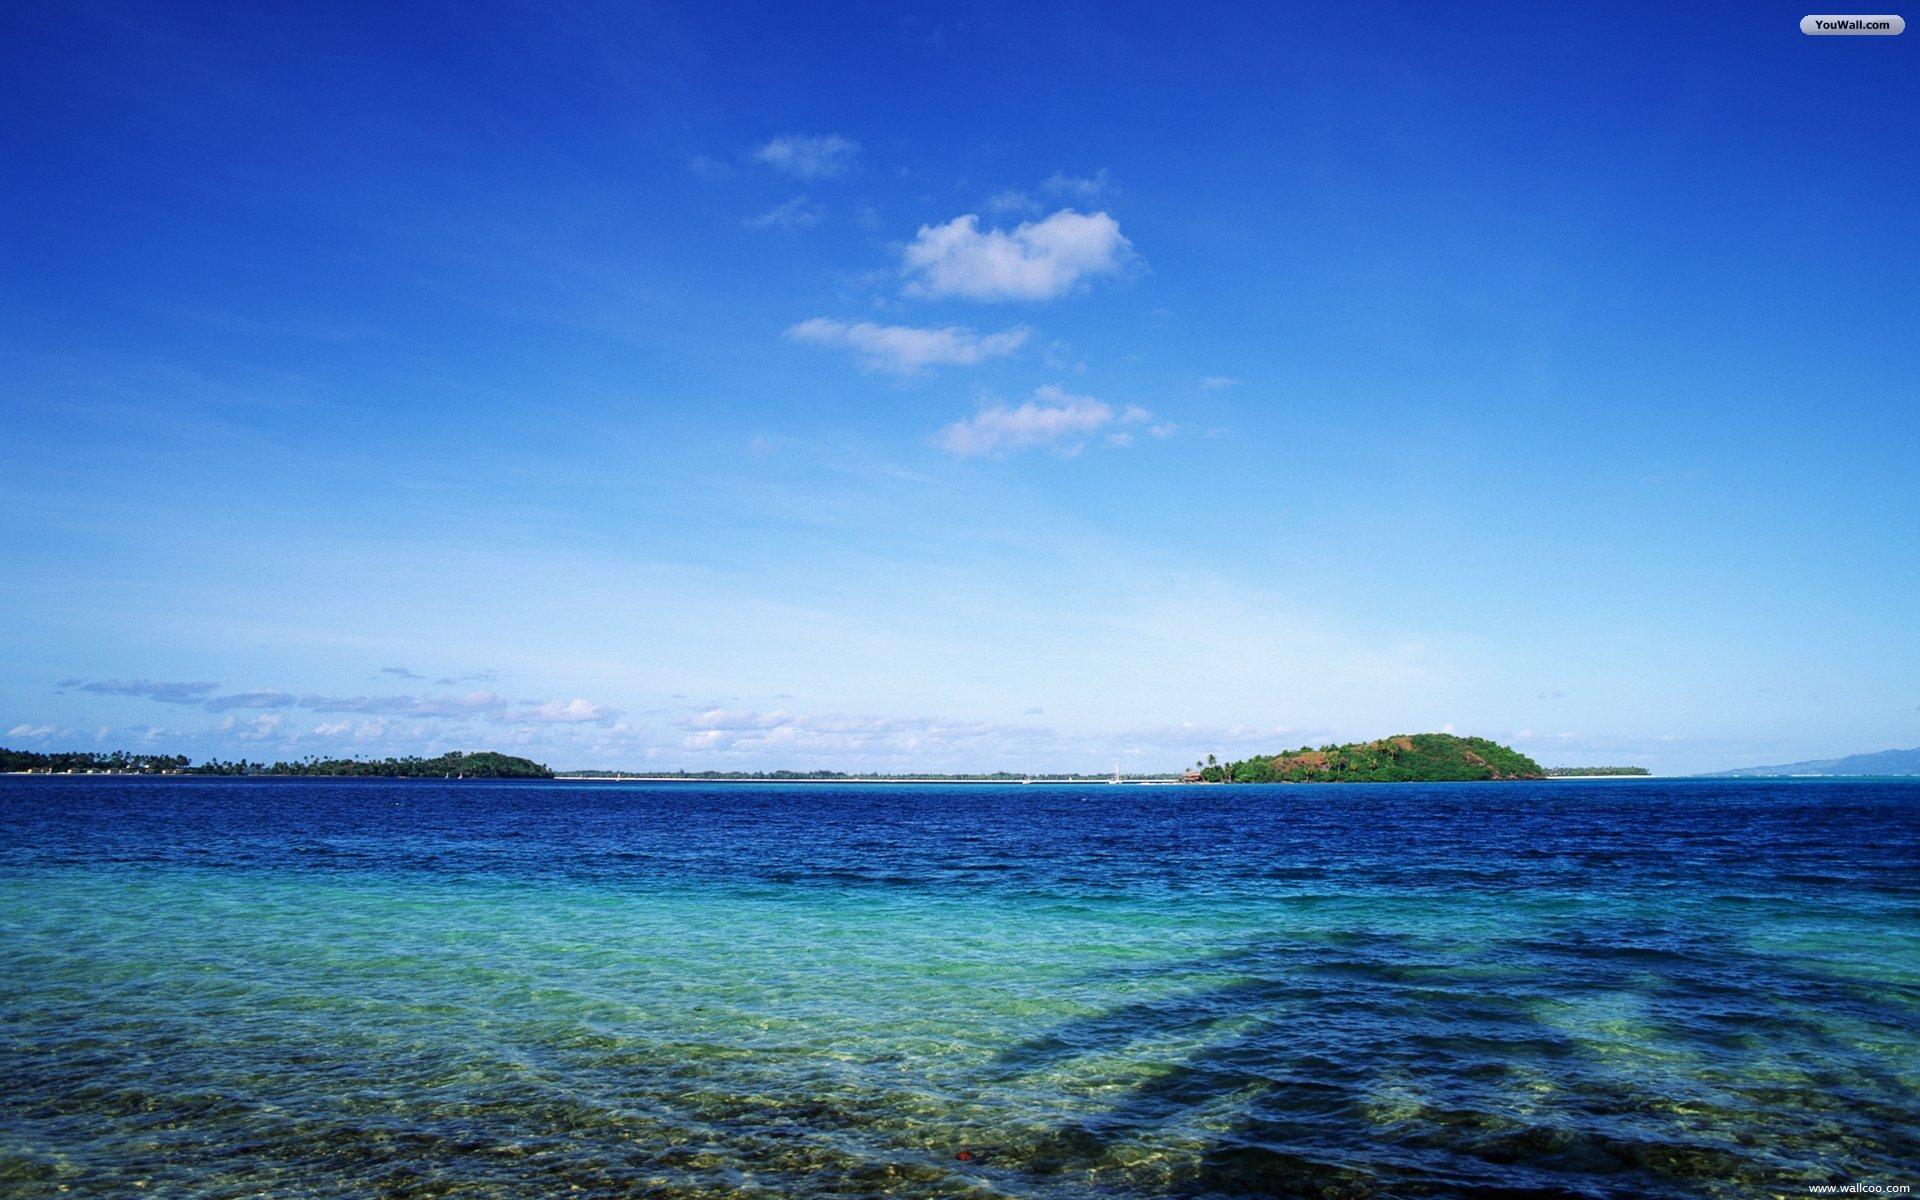 Cool Blue Sea Image